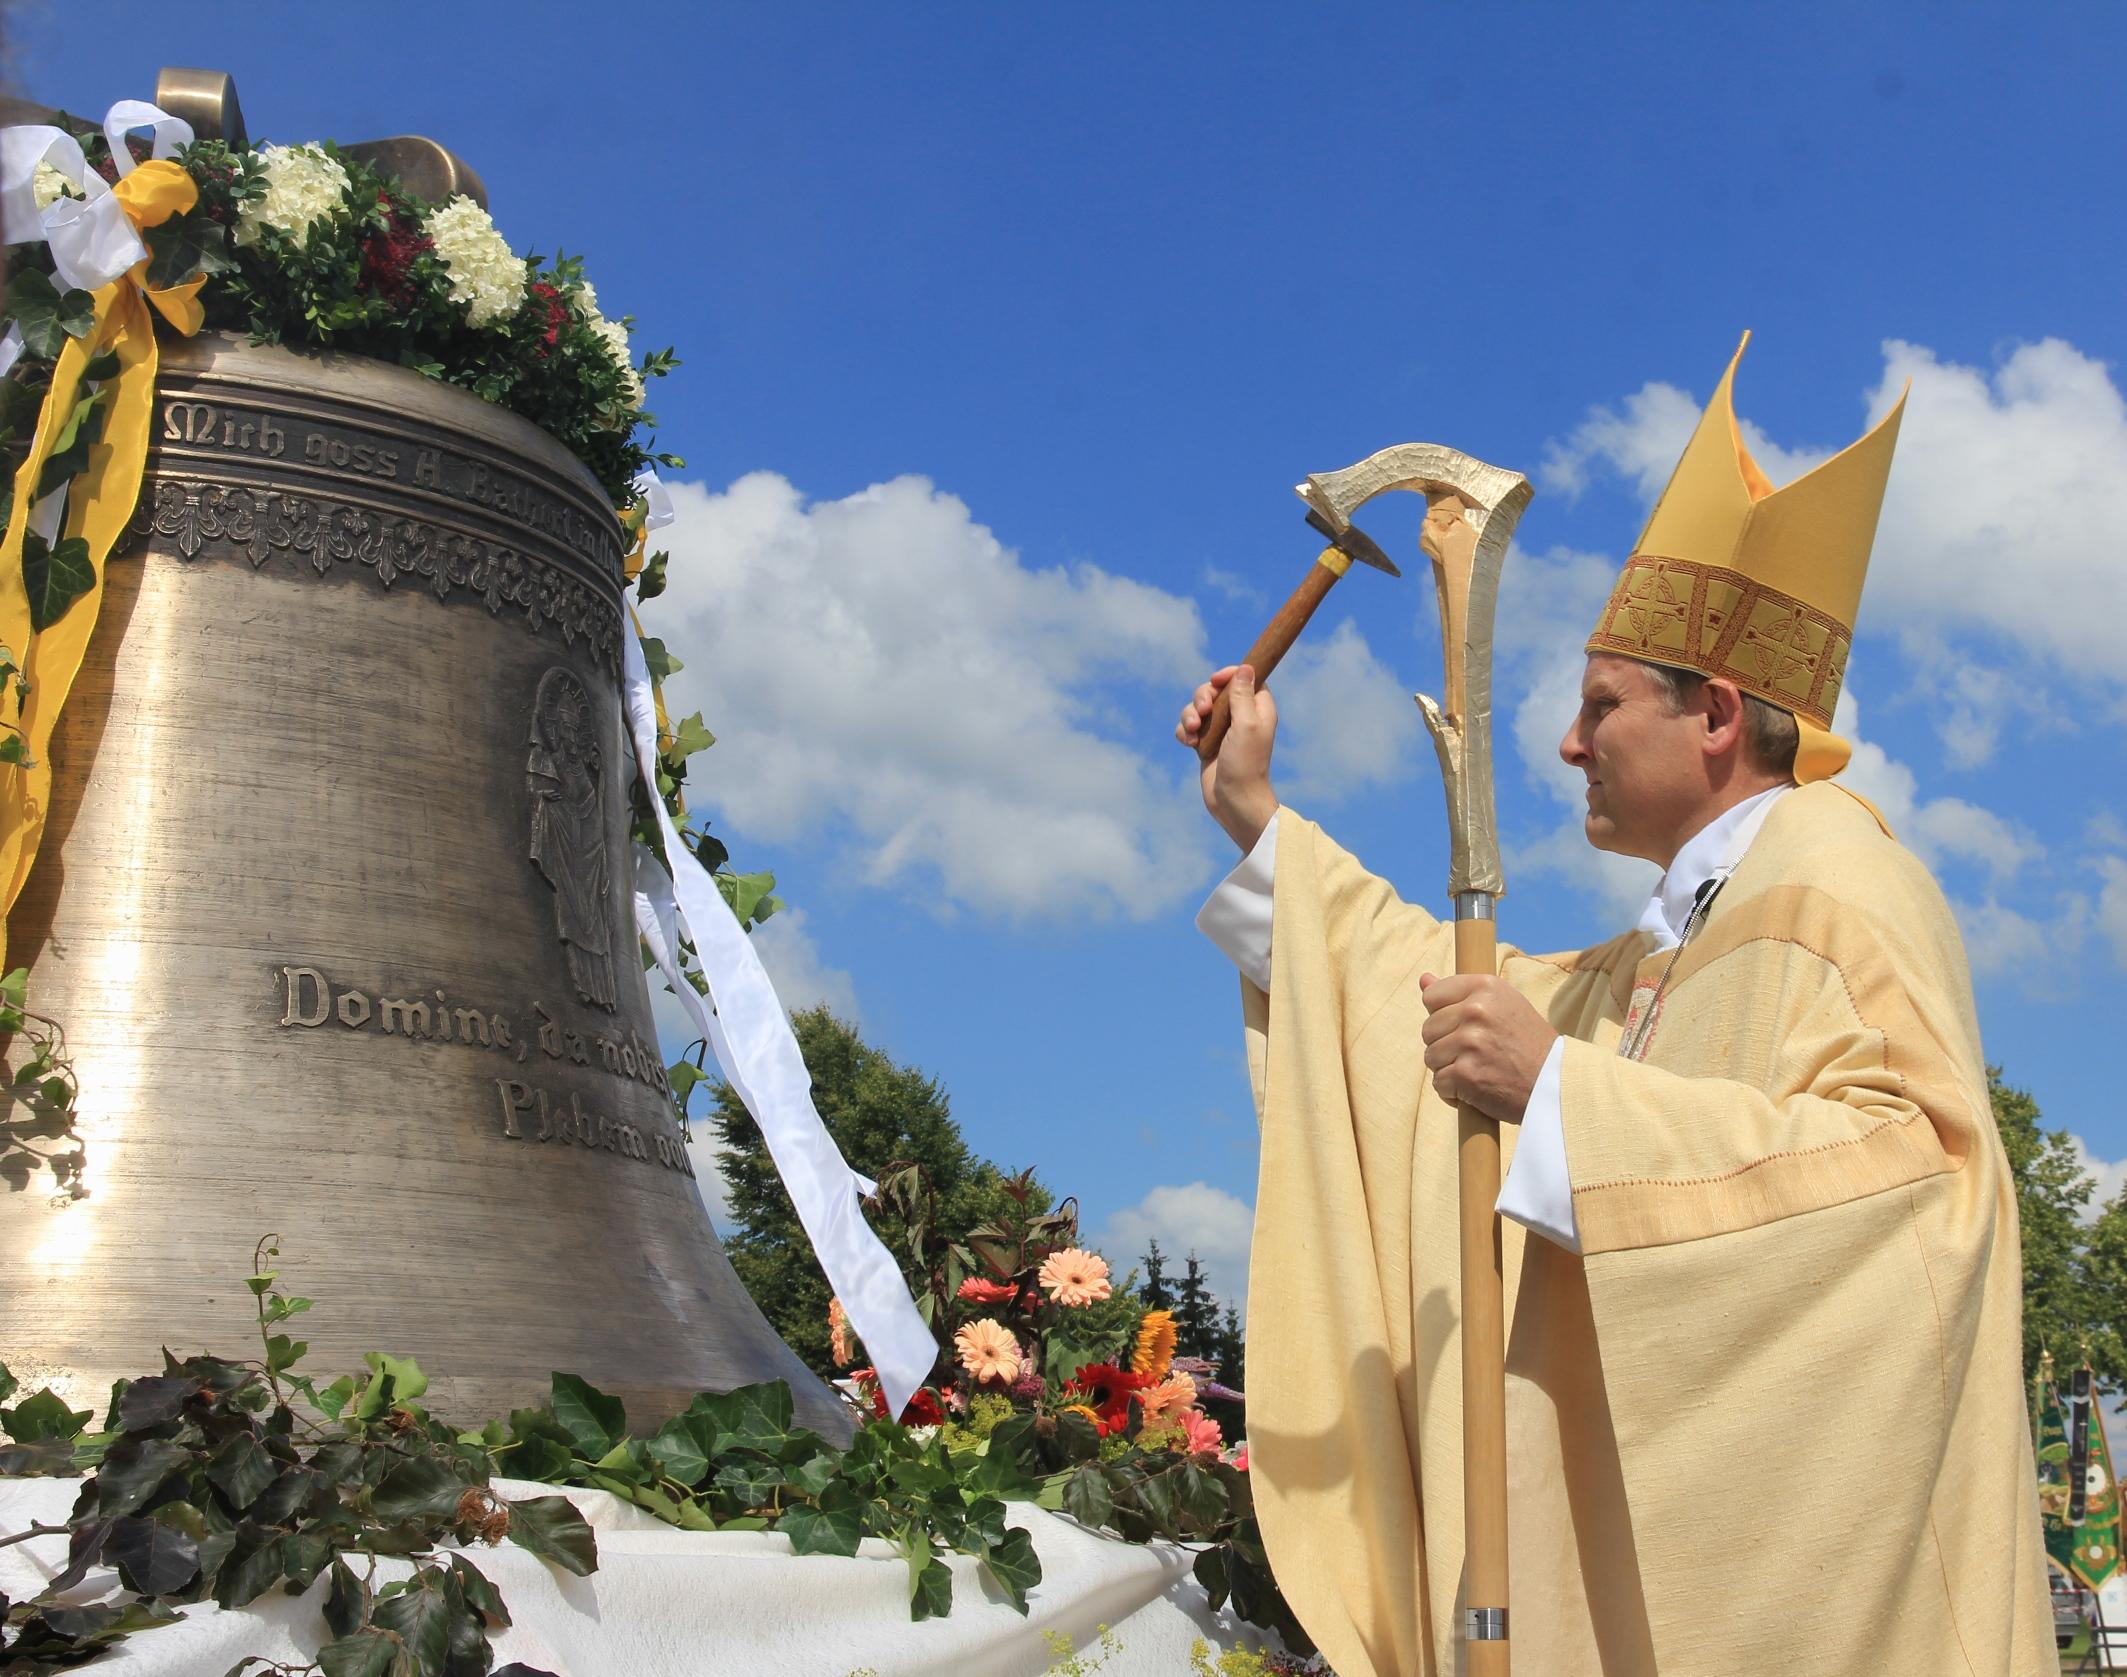 Glockenweihe Lengenwang